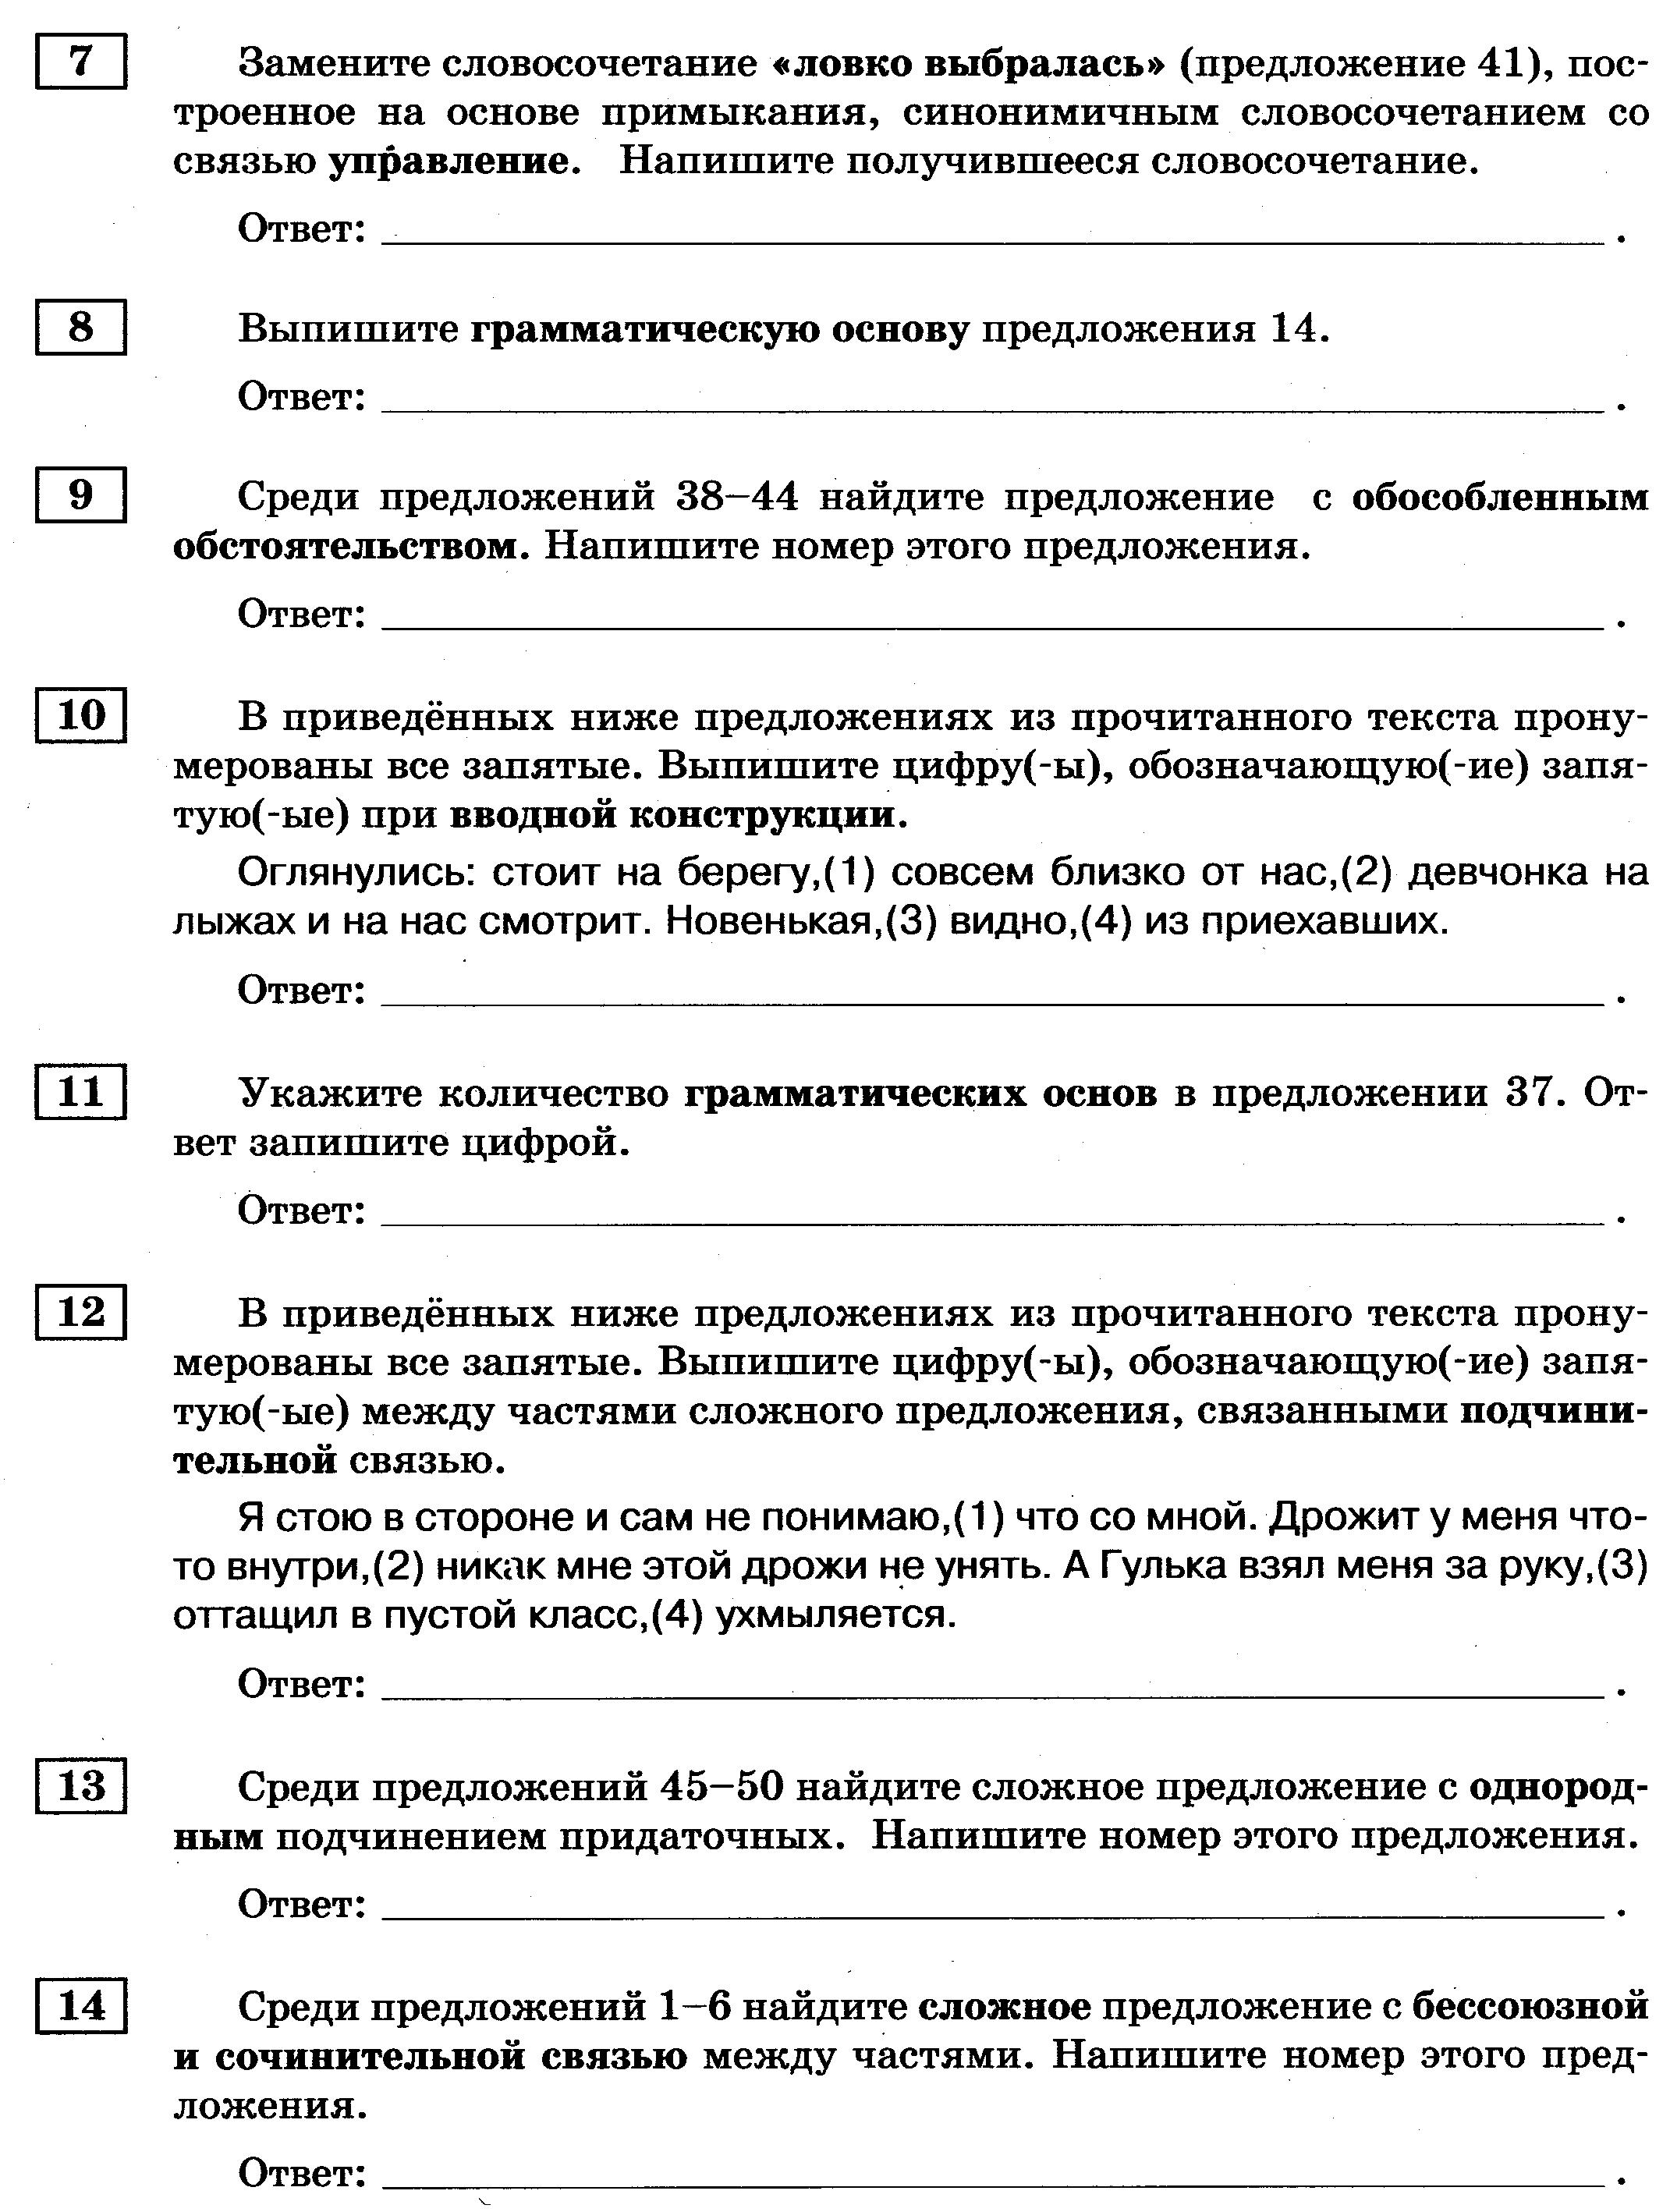 C:\Documents and Settings\Наташа\Рабочий стол\ОГЭ 2016\КИМы Степановой ОГЭ-2016\img286.jpg